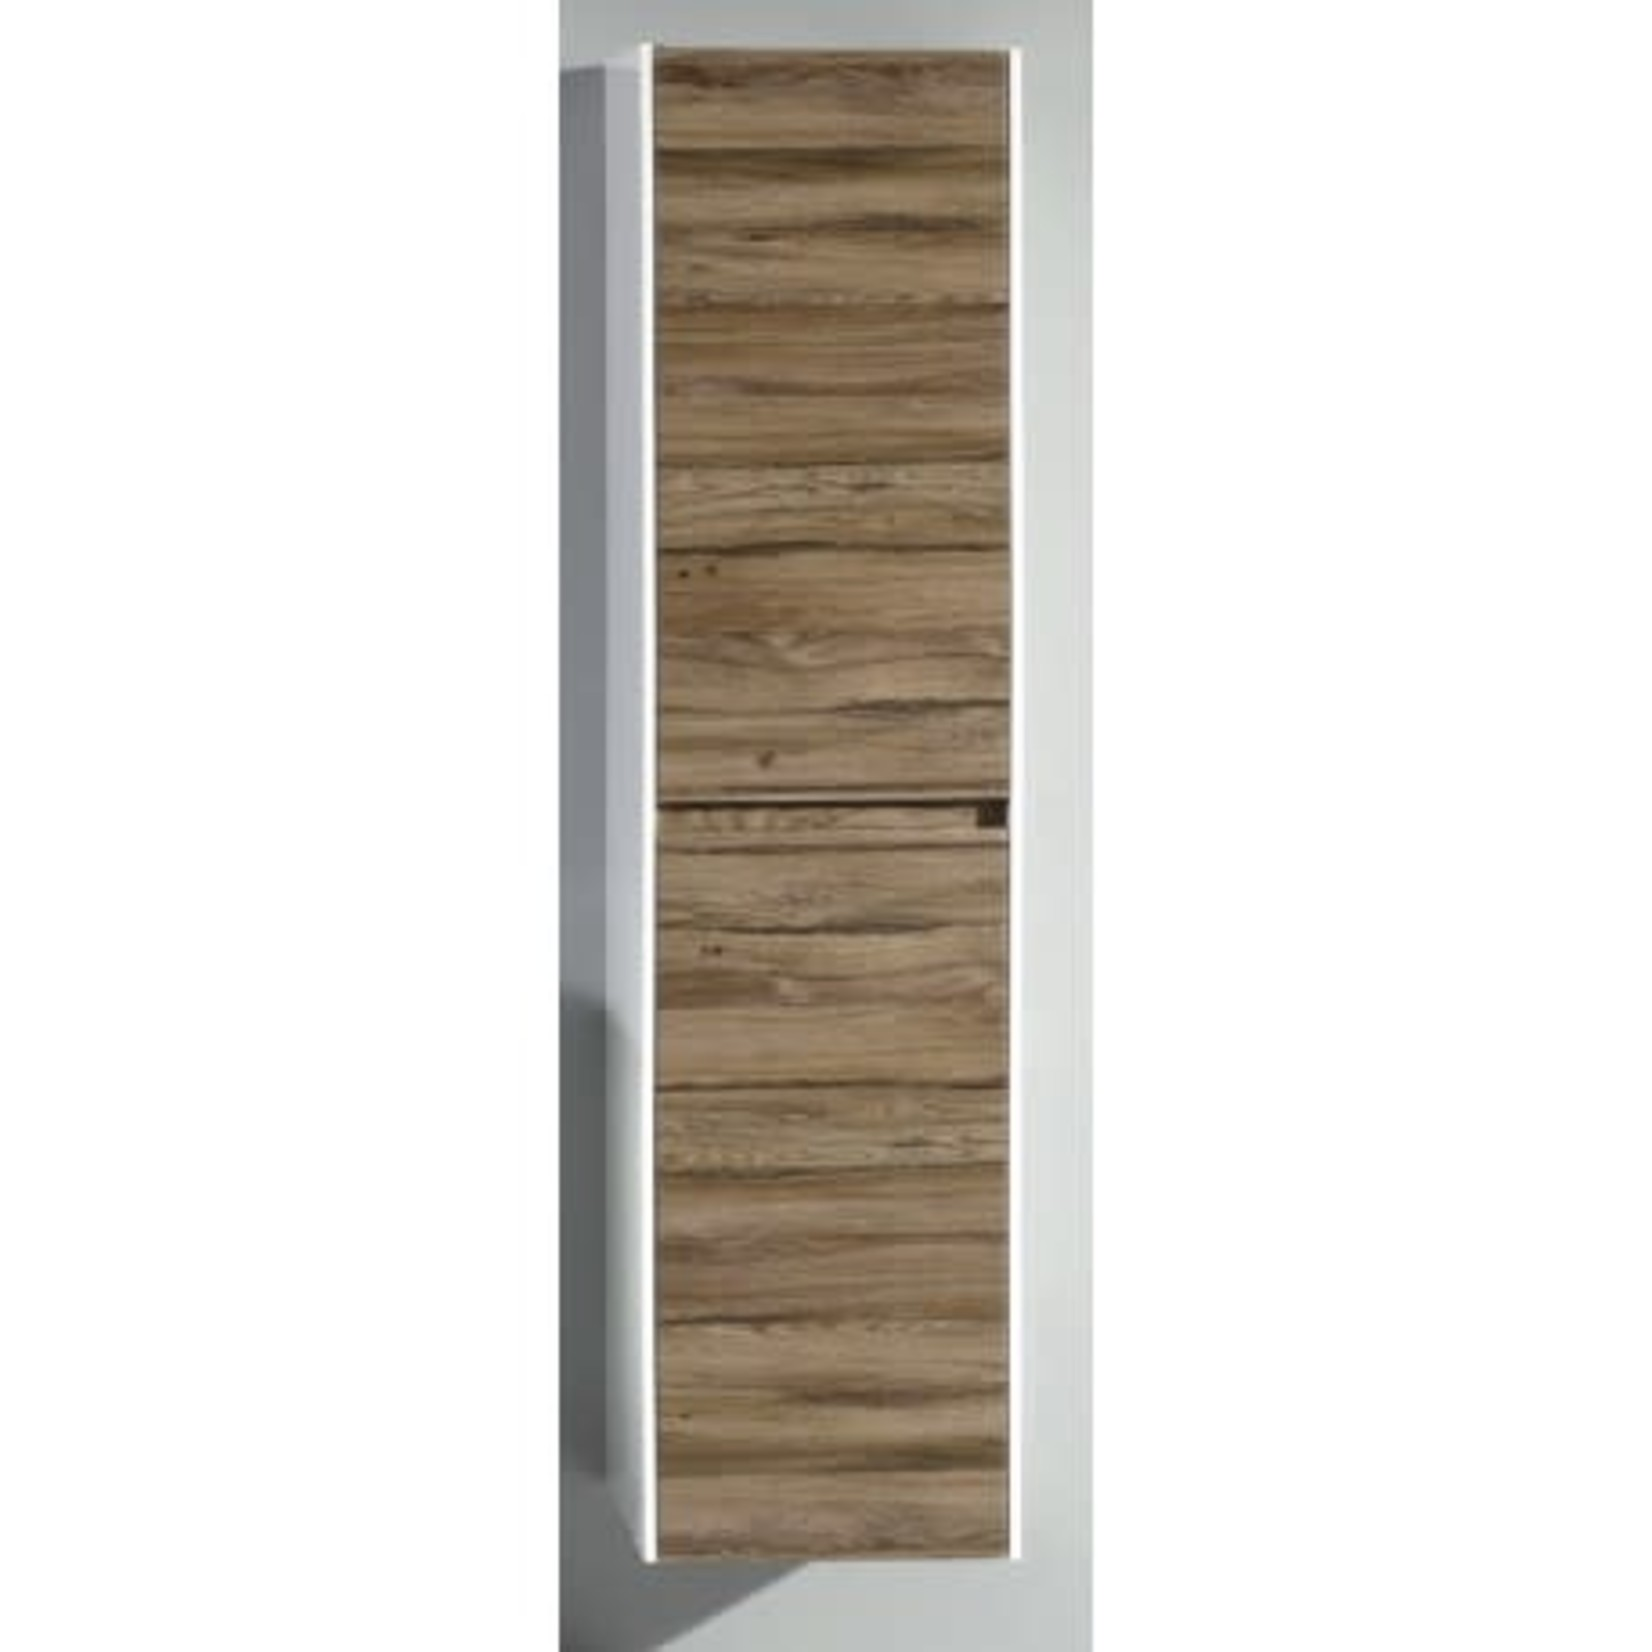 Side cabinet id-315-16